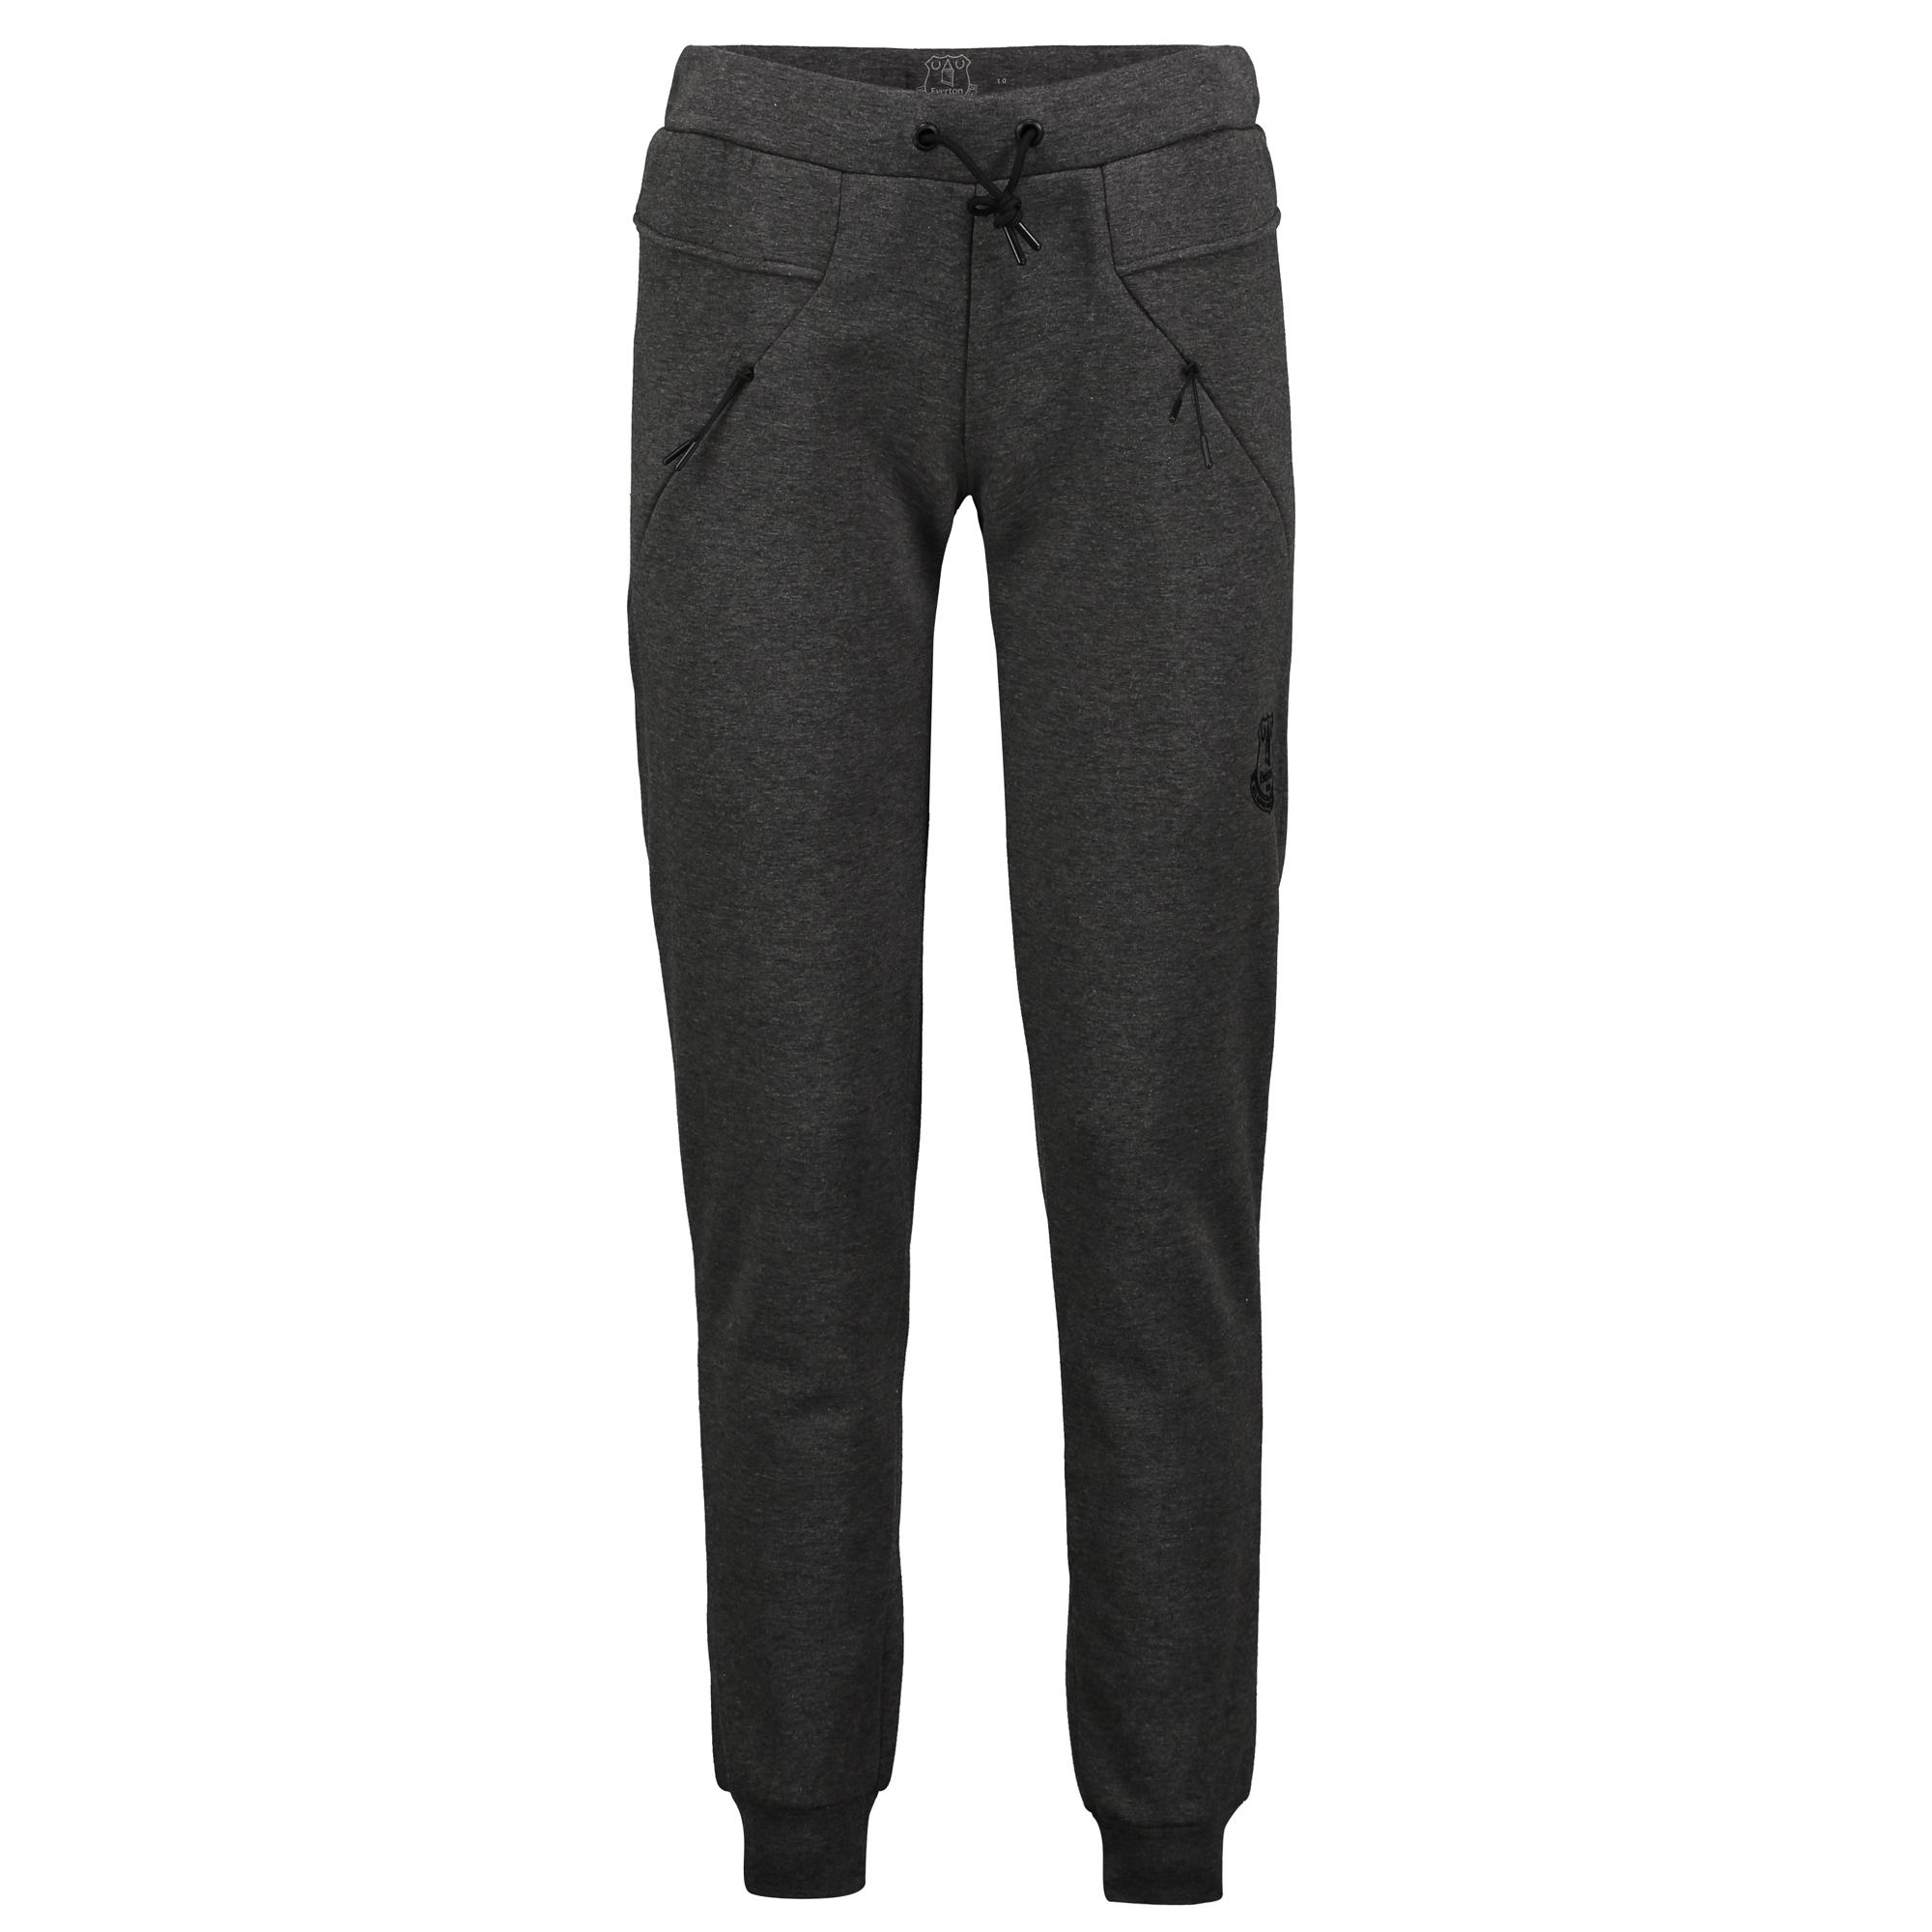 Image of Everton Ath Tech Fleece Jogger - Charcoal Marl - Womens